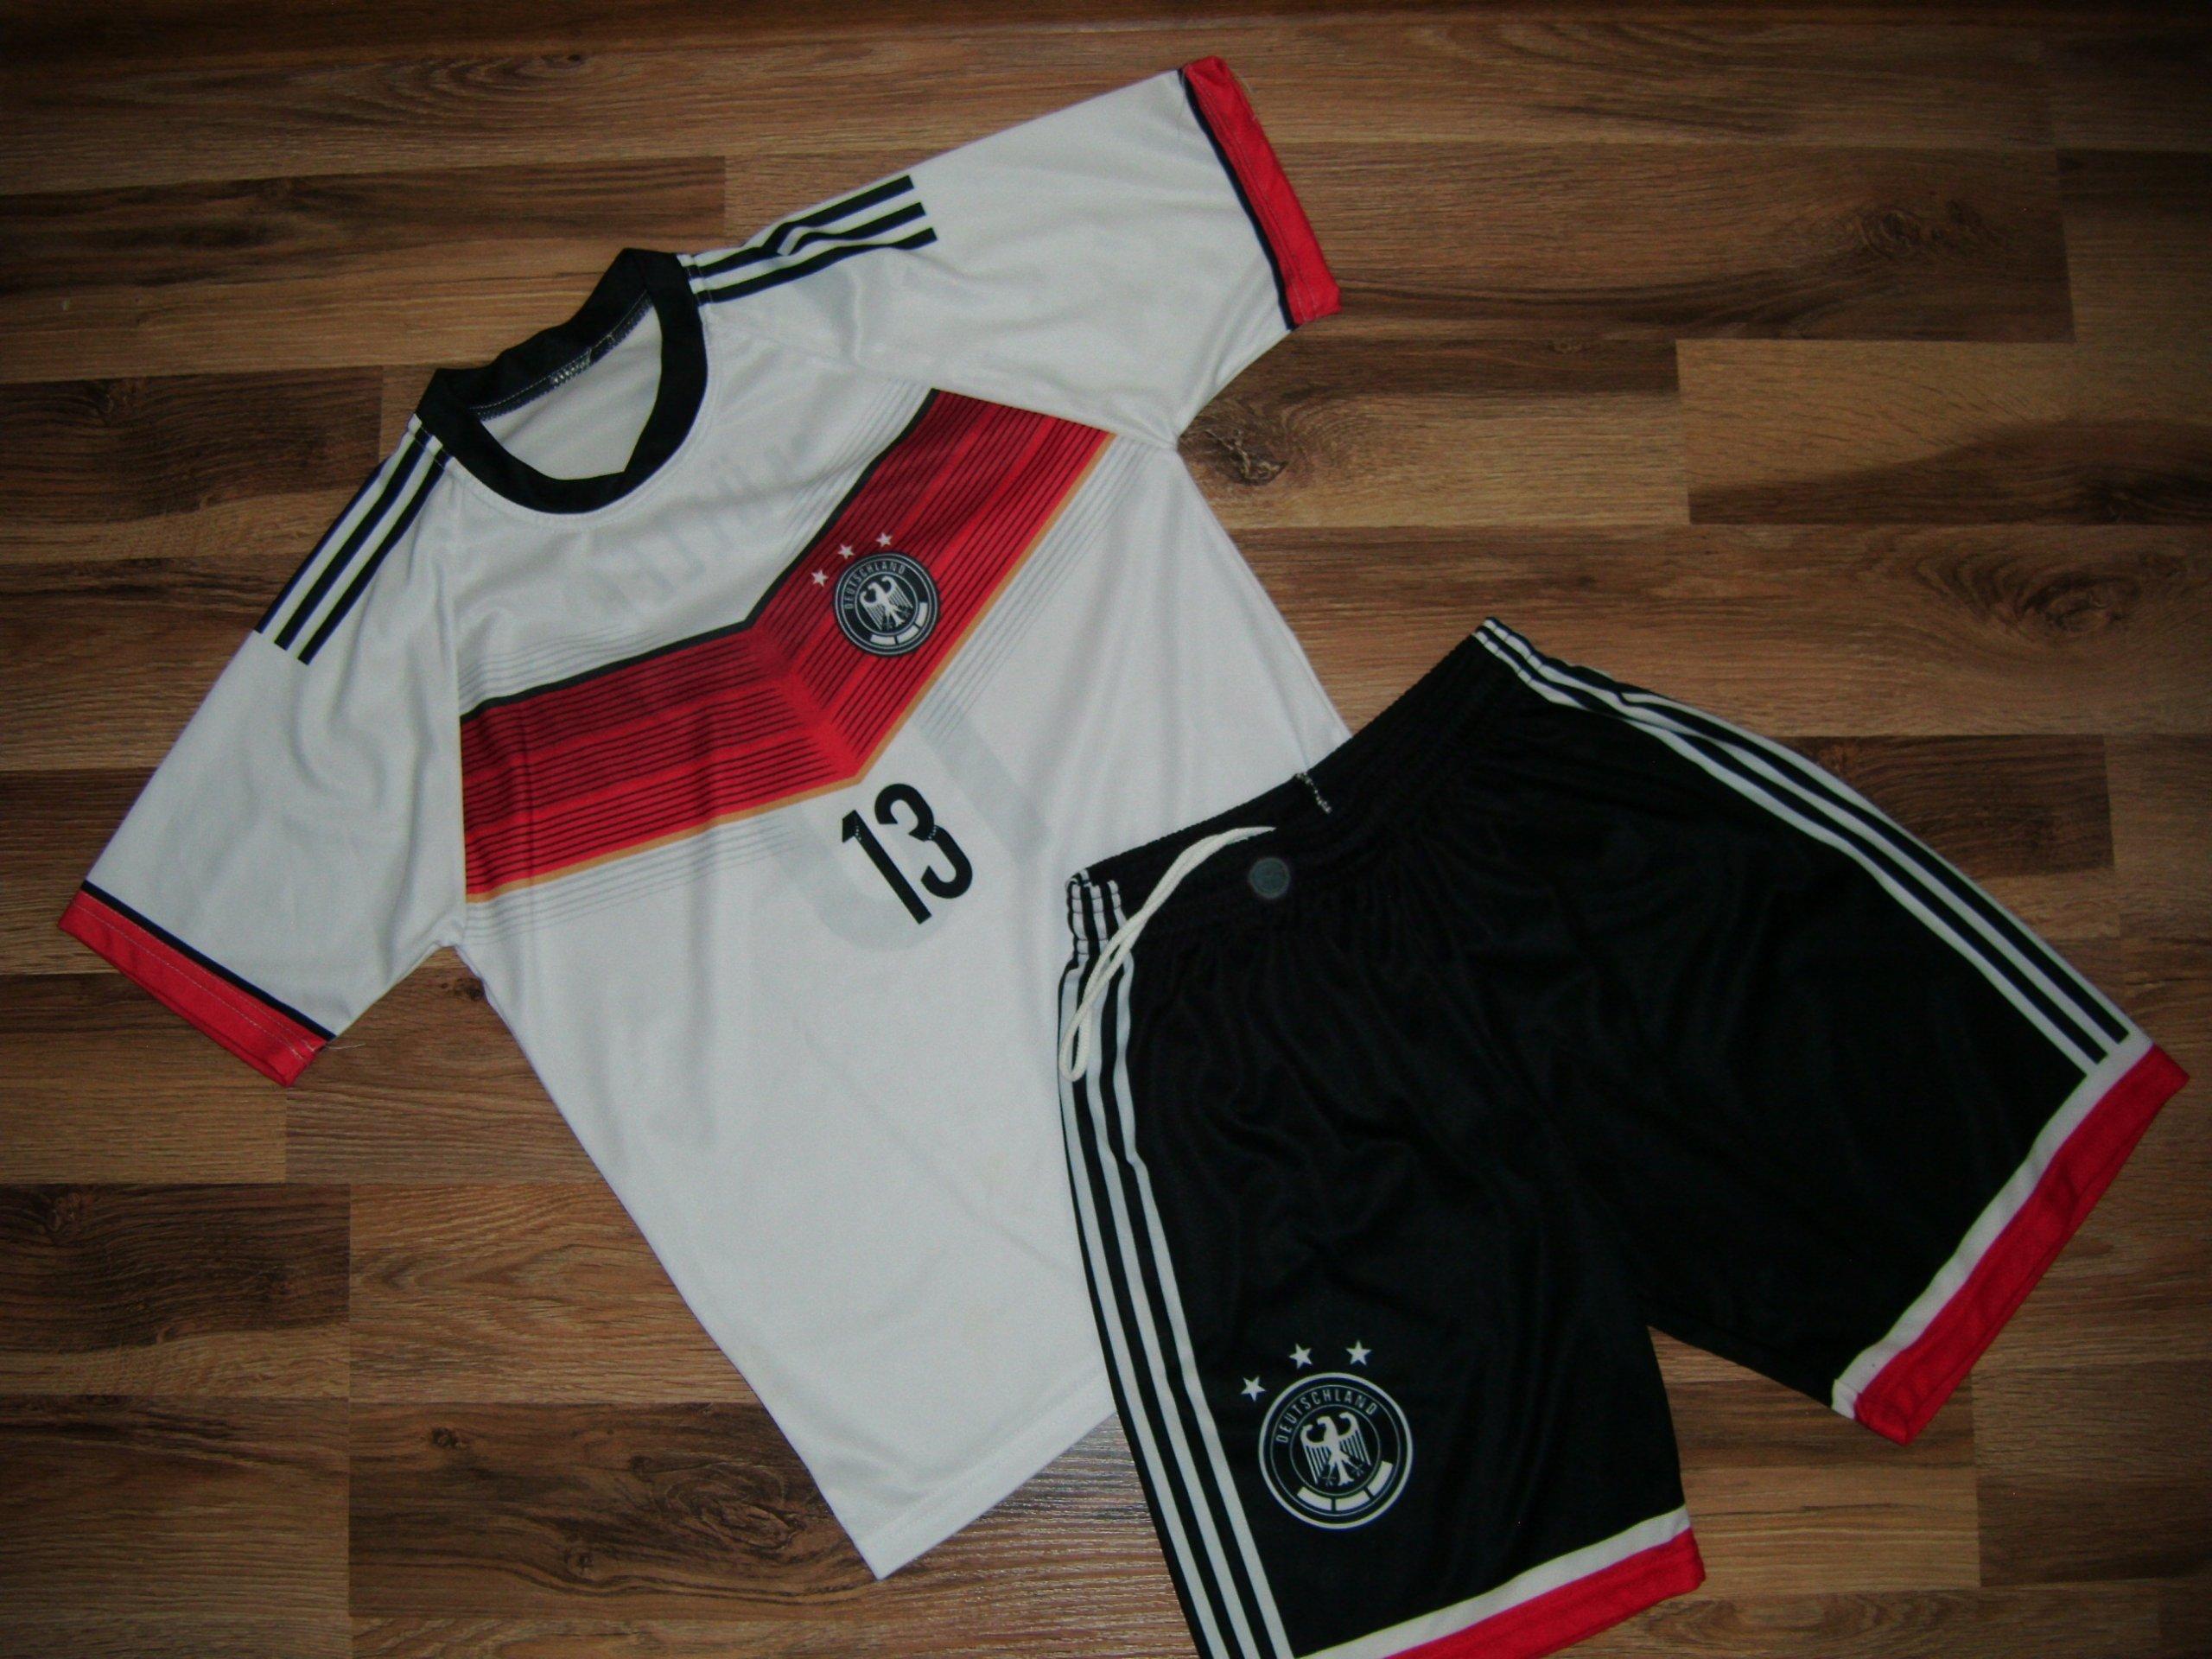 91fdfc1d0 140 strój piłkarski MULLER Niemcy - 7280324111 - oficjalne archiwum ...